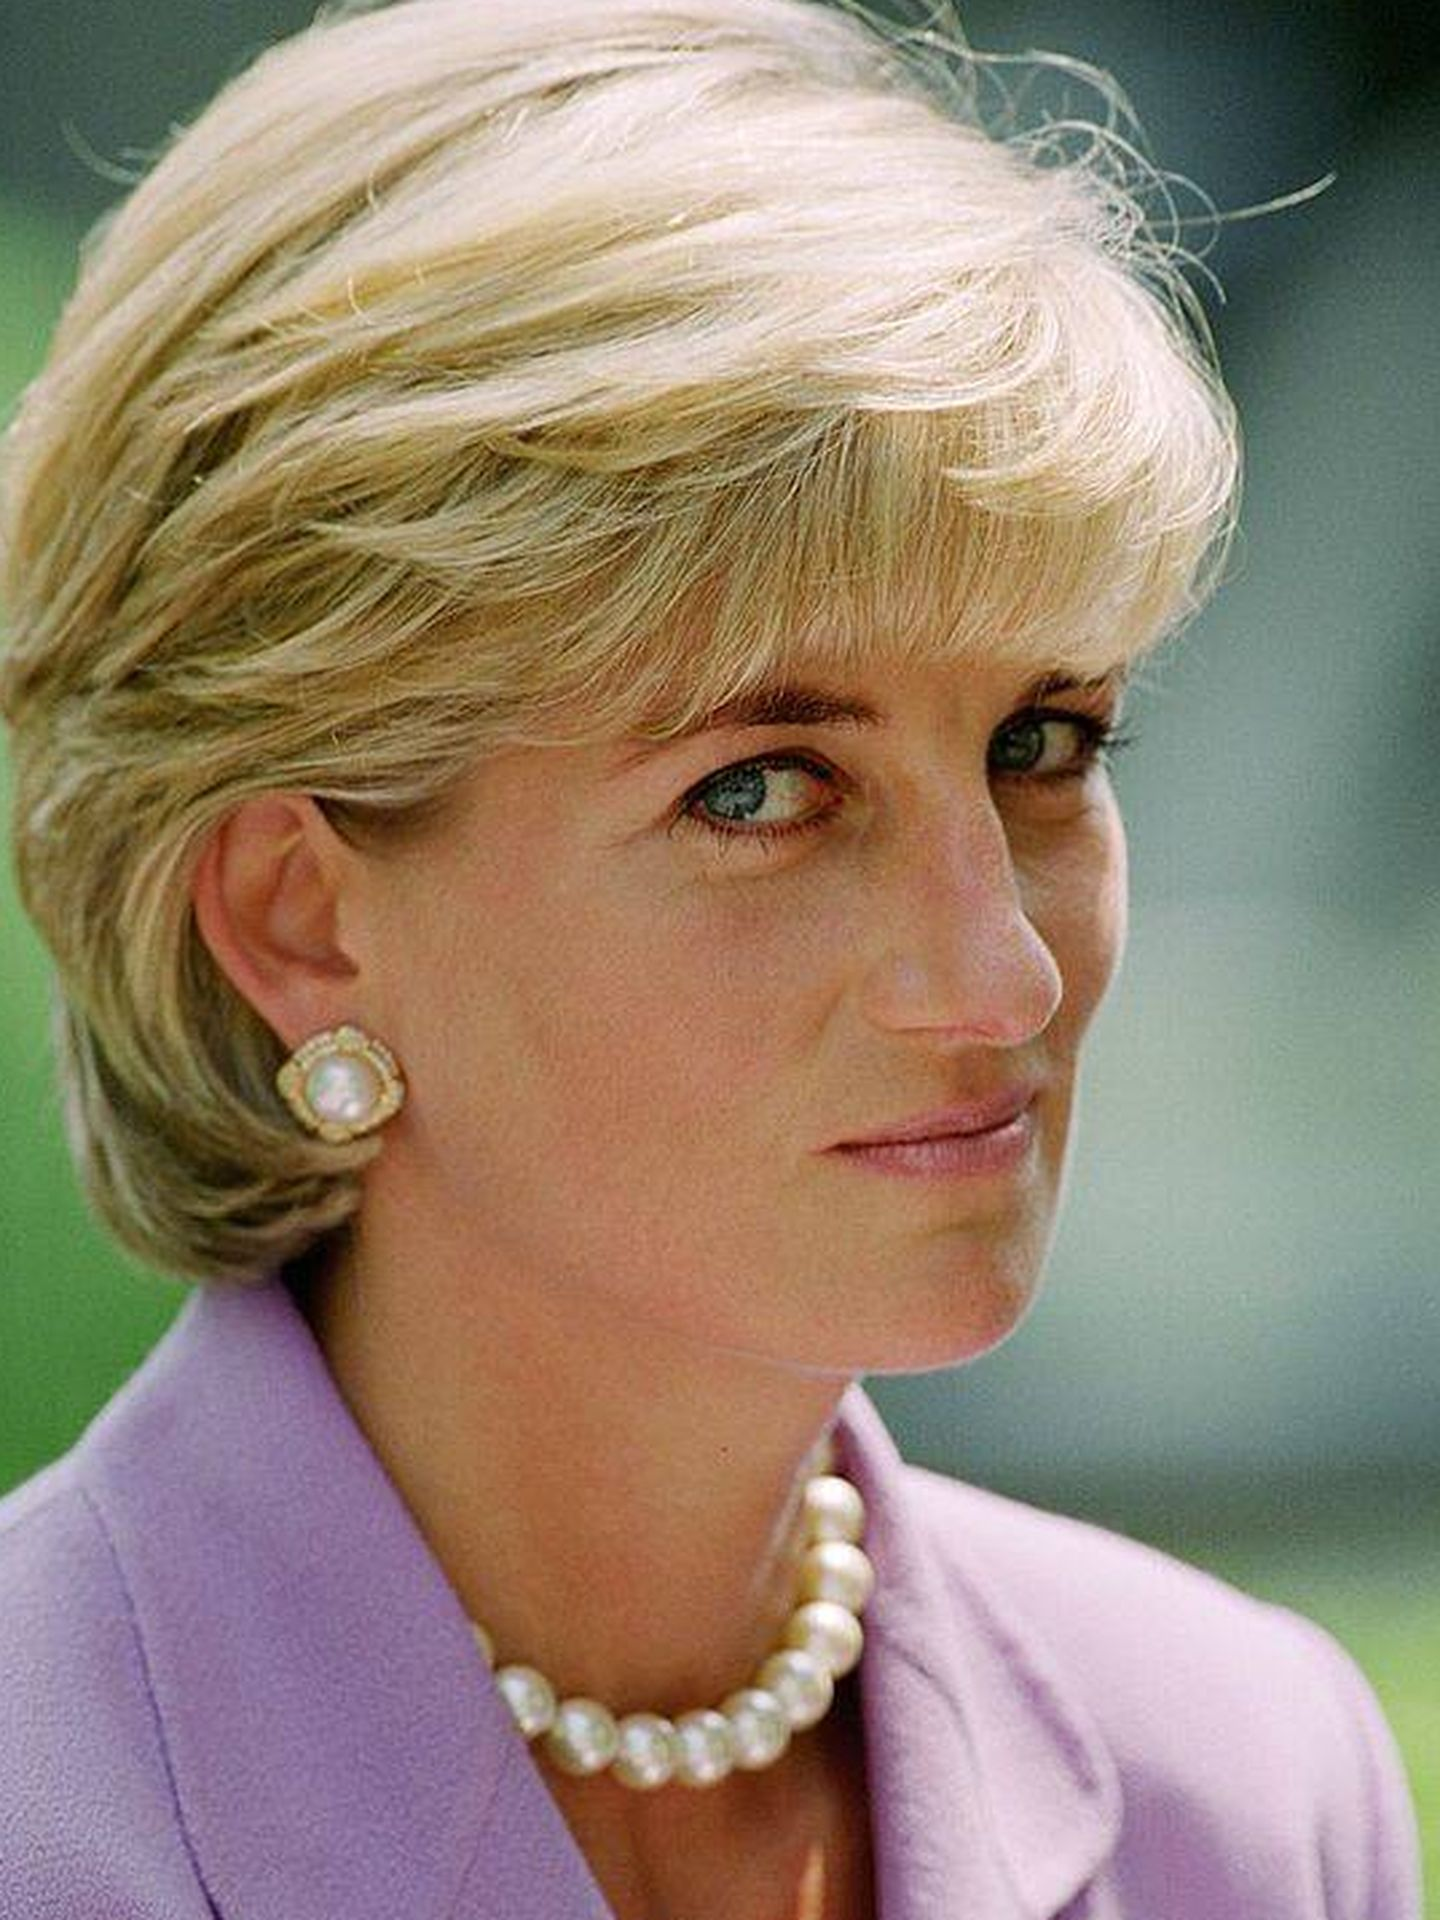 Diana de Gales. (Getty Images)